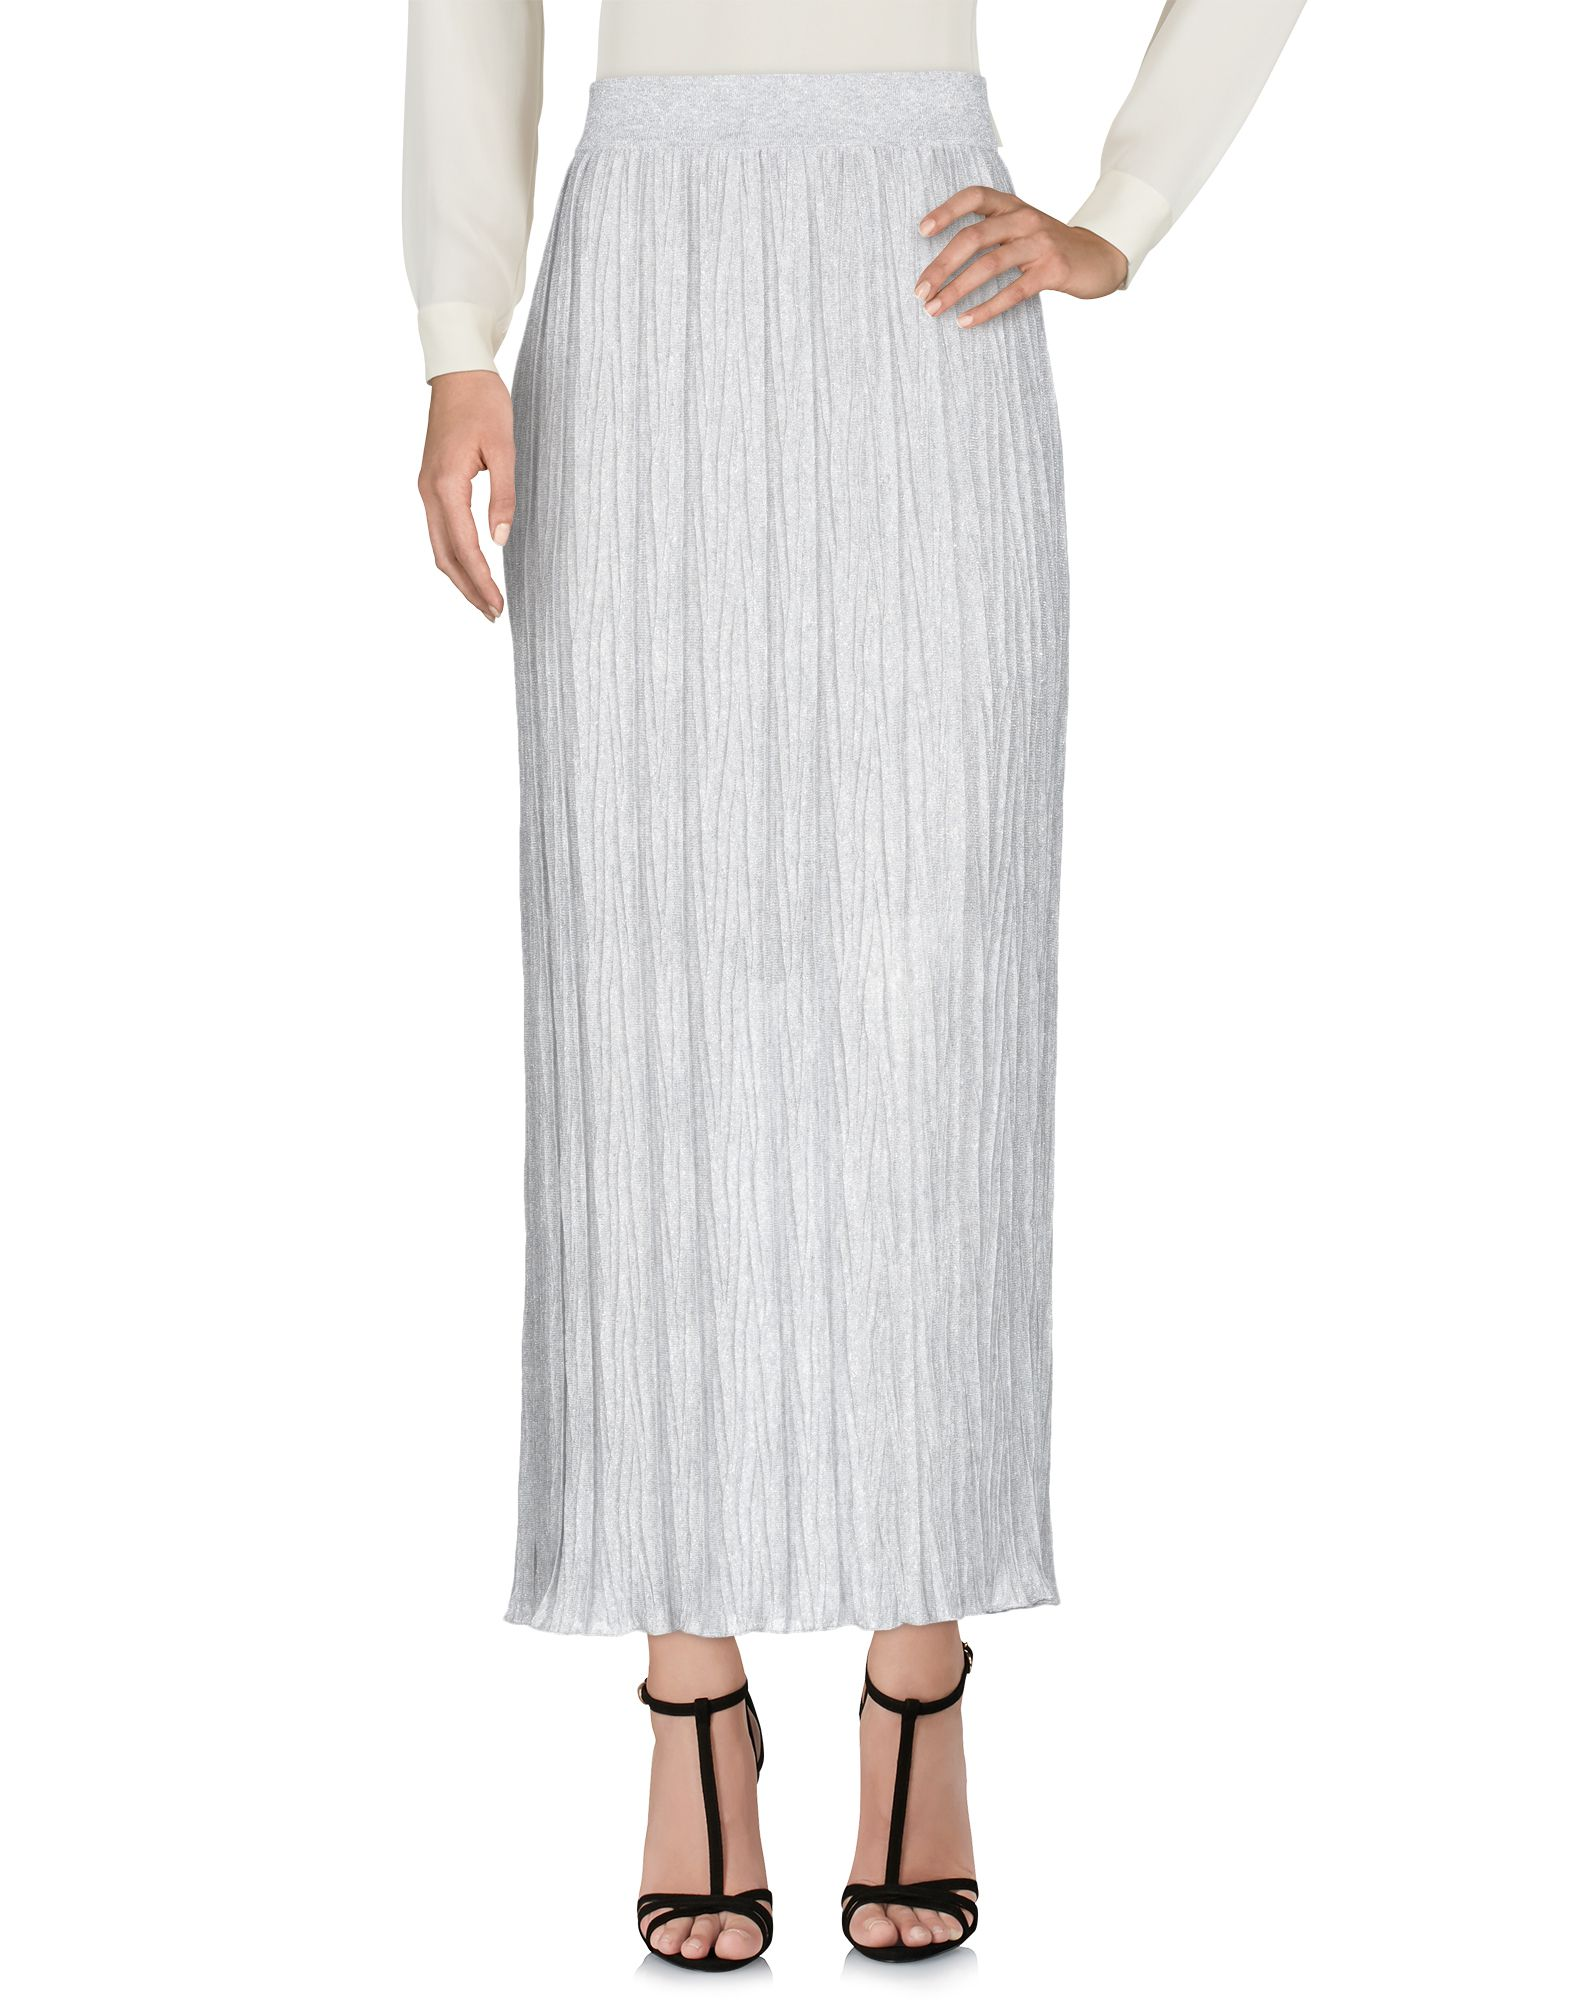 TABARONI CASHMERE Длинная юбка tabaroni cashmere свитер